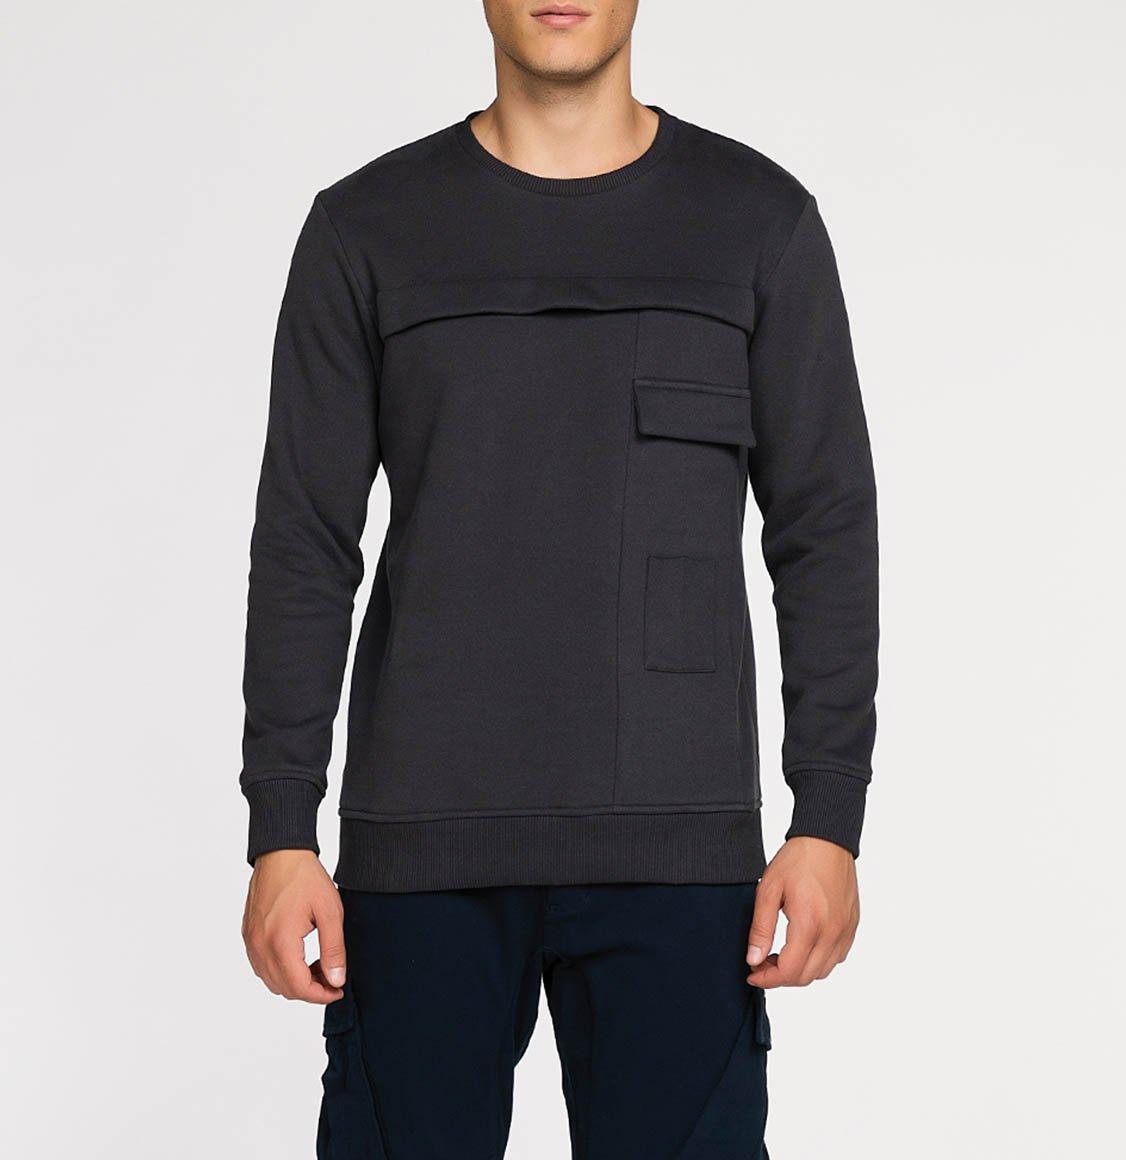 The Project Garments Panelled Cotton Jersey Sweatshirt Meteorite